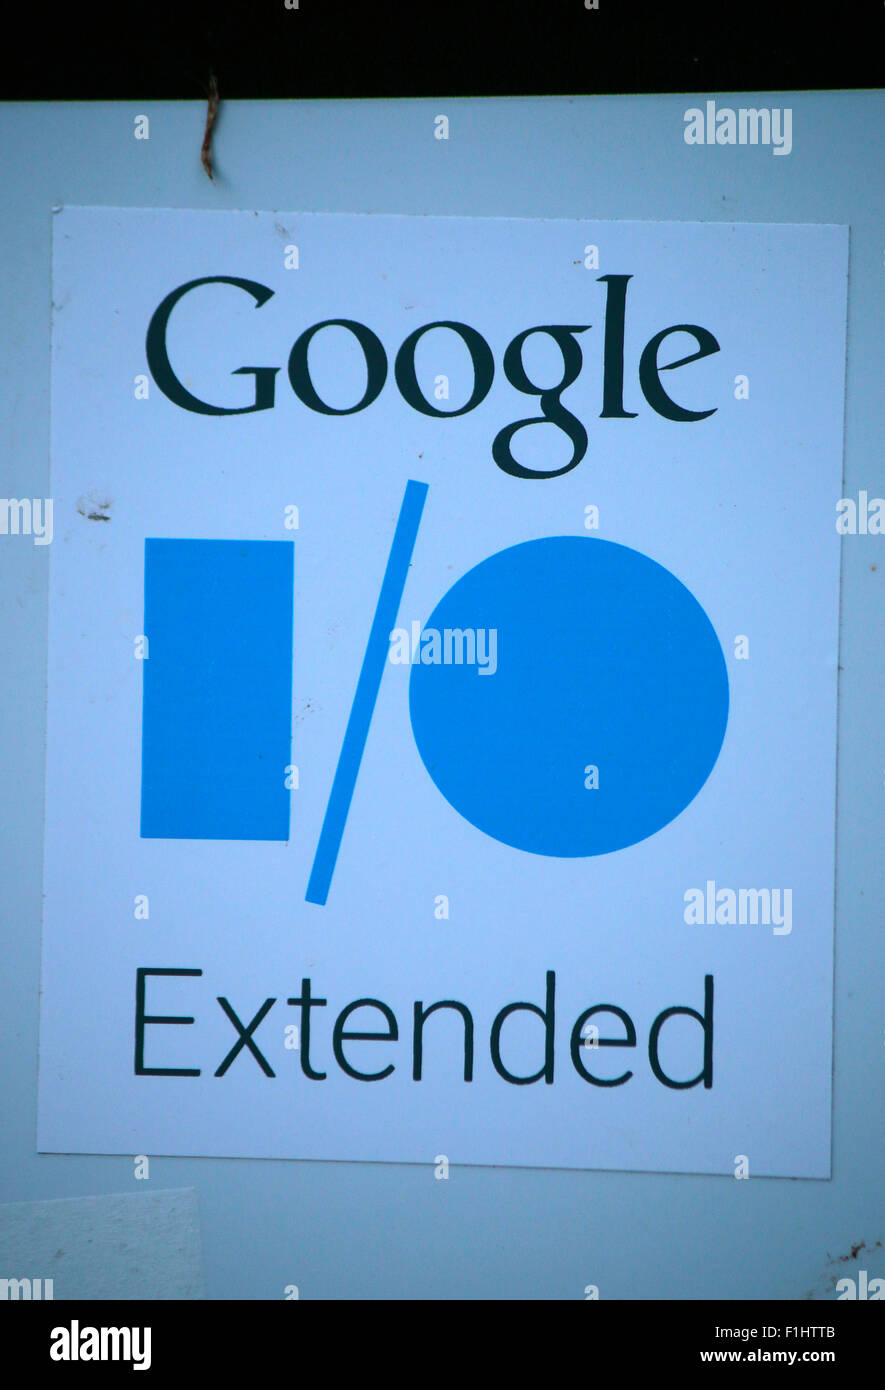 Markennamen: 'Google Extended', Berlin. - Stock Image